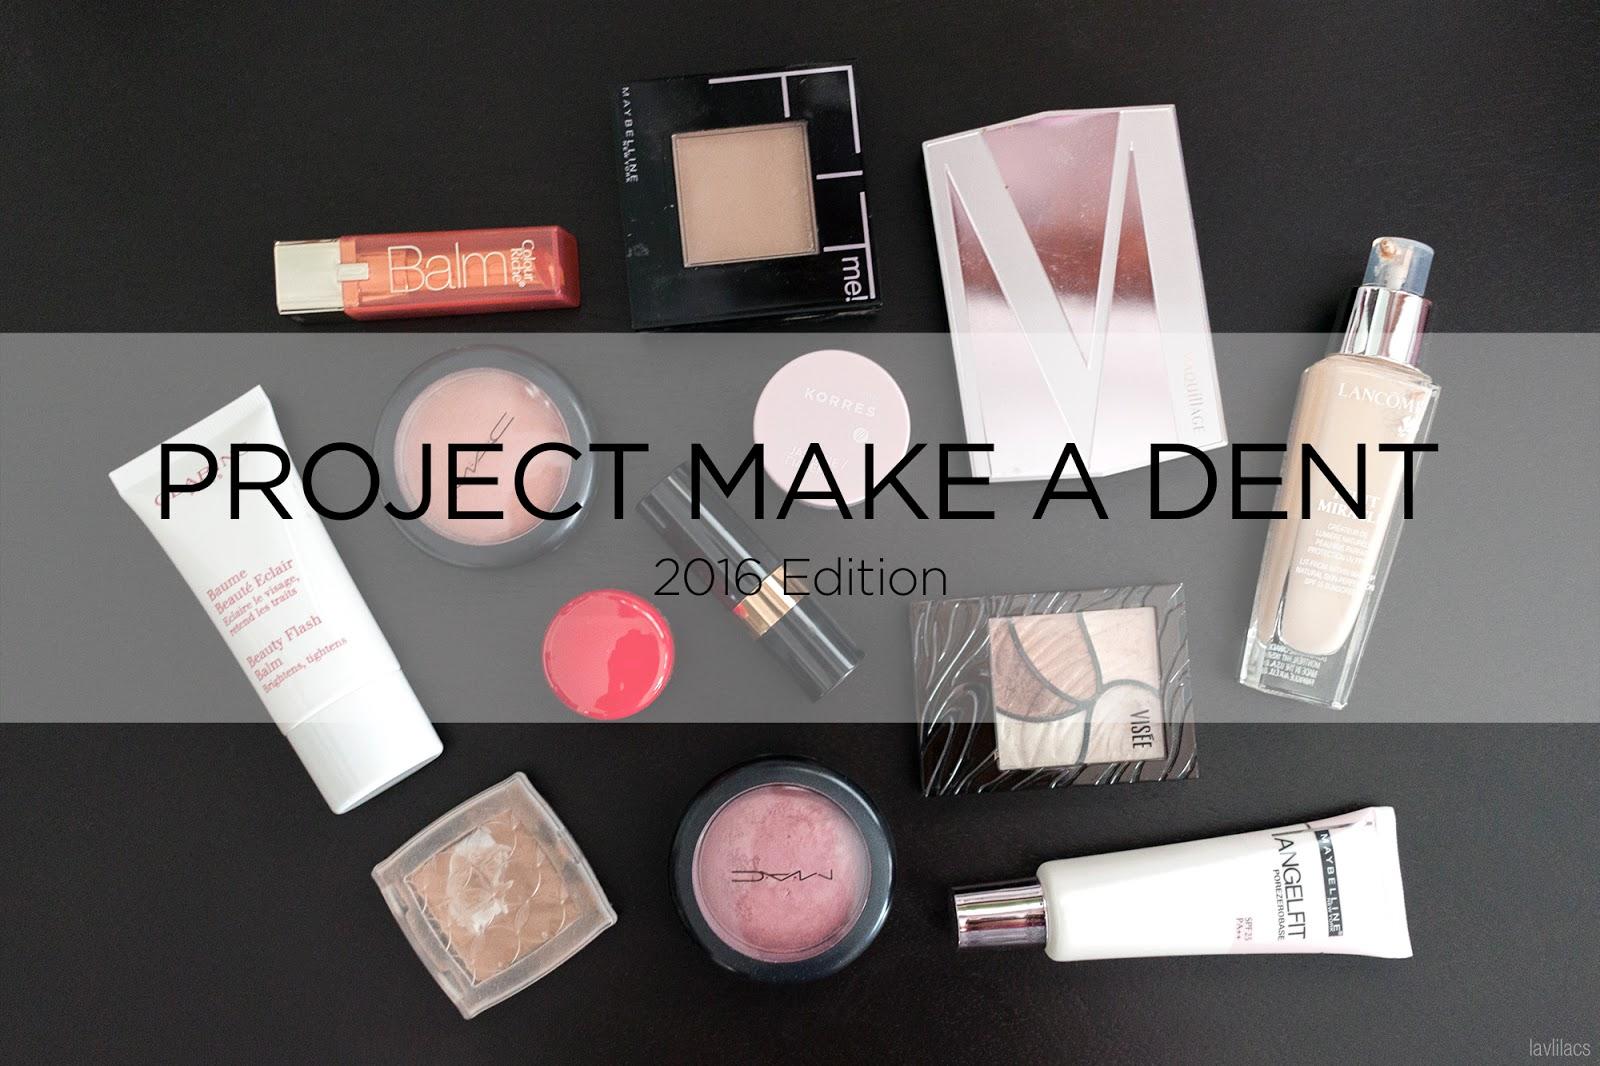 Project Make A Dent 2016